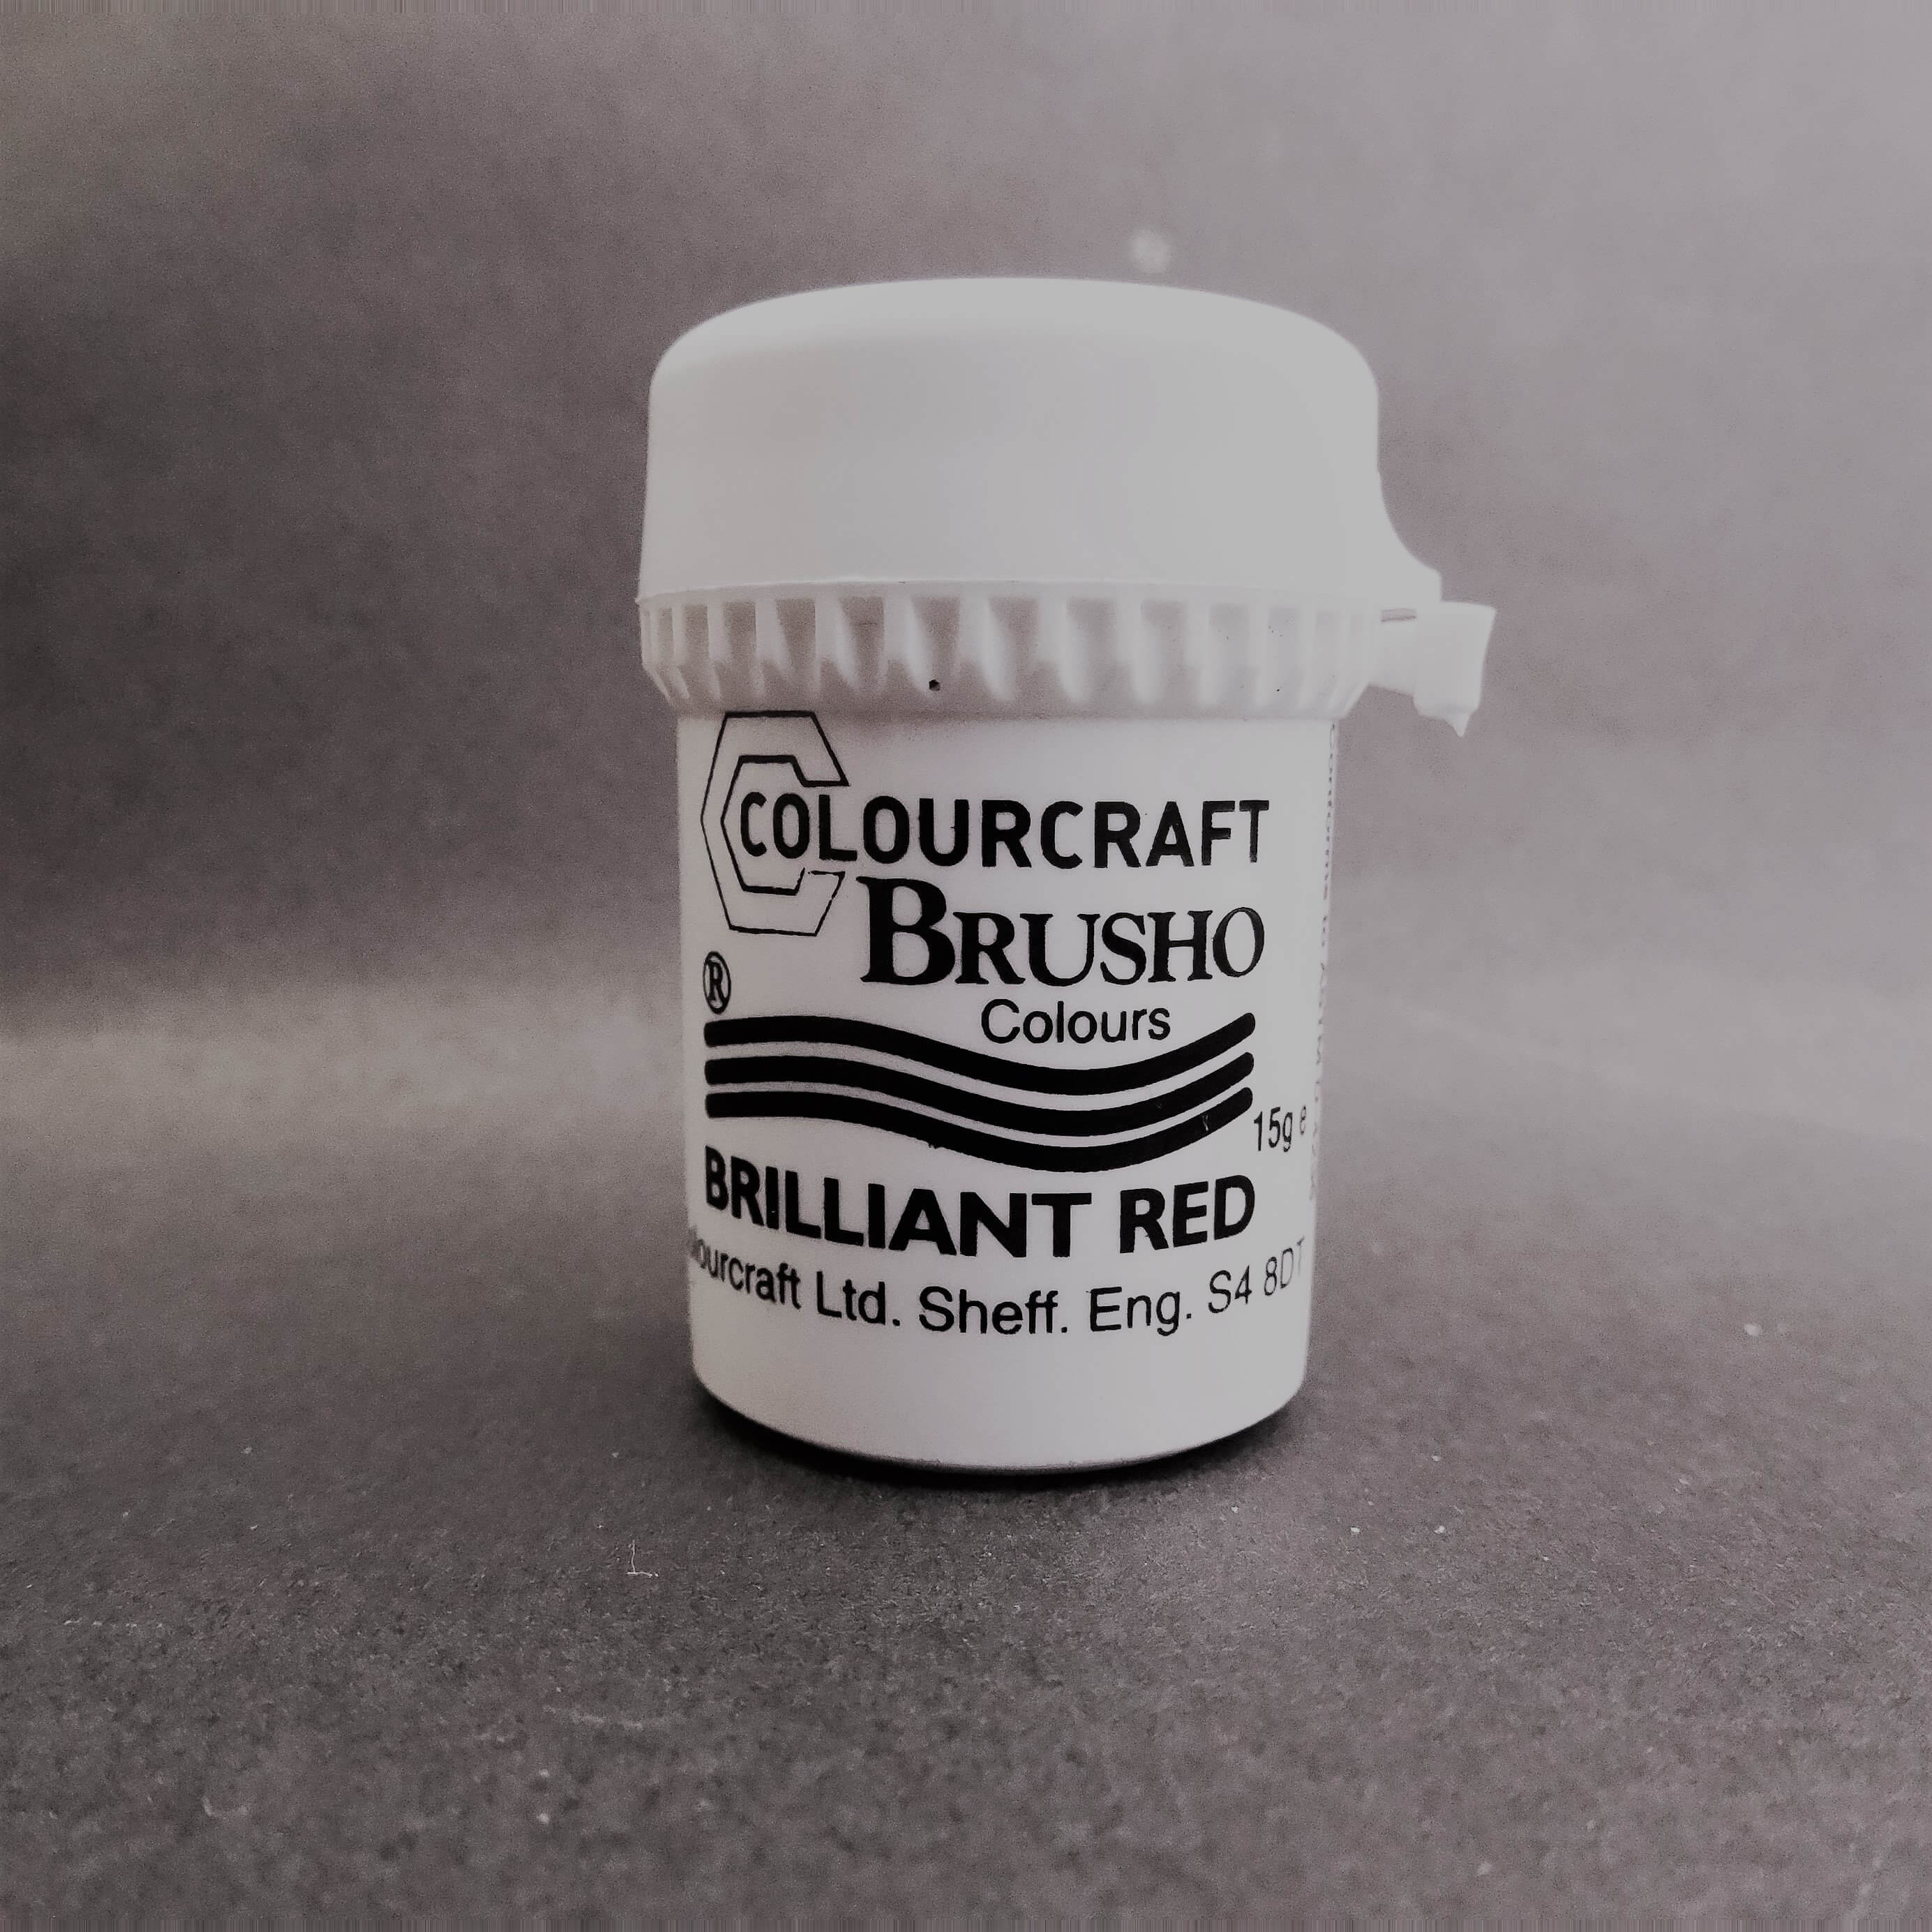 Brusho Brilliant Red 15 ml